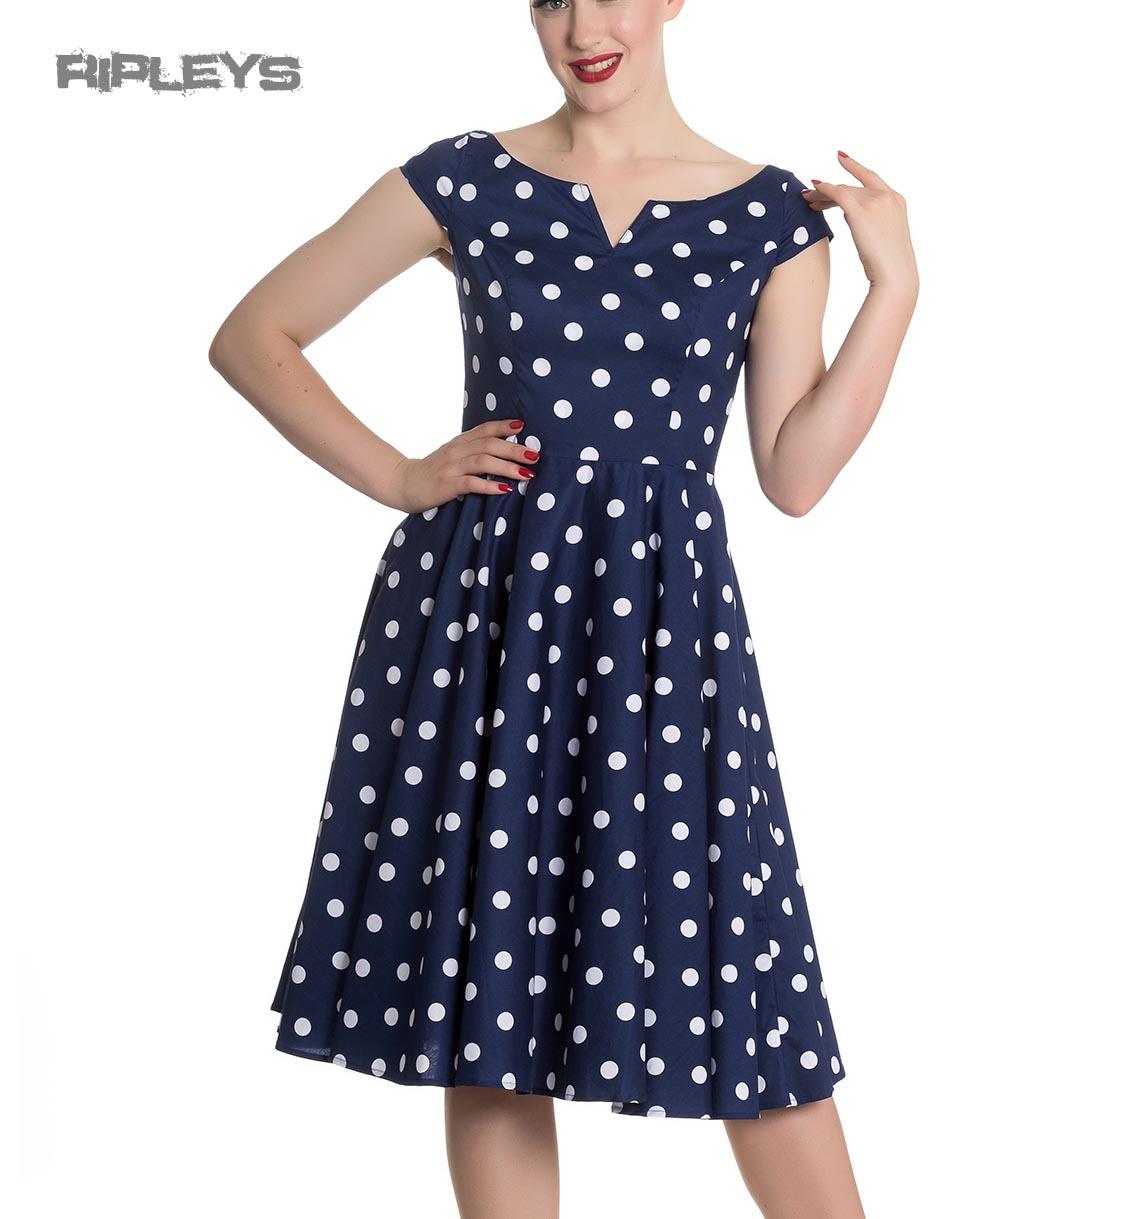 Hell-Bunny-50s-Dress-Polka-Dot-NICKY-Pin-Up-Rockabilly-Navy-Blue-All-Sizes thumbnail 10